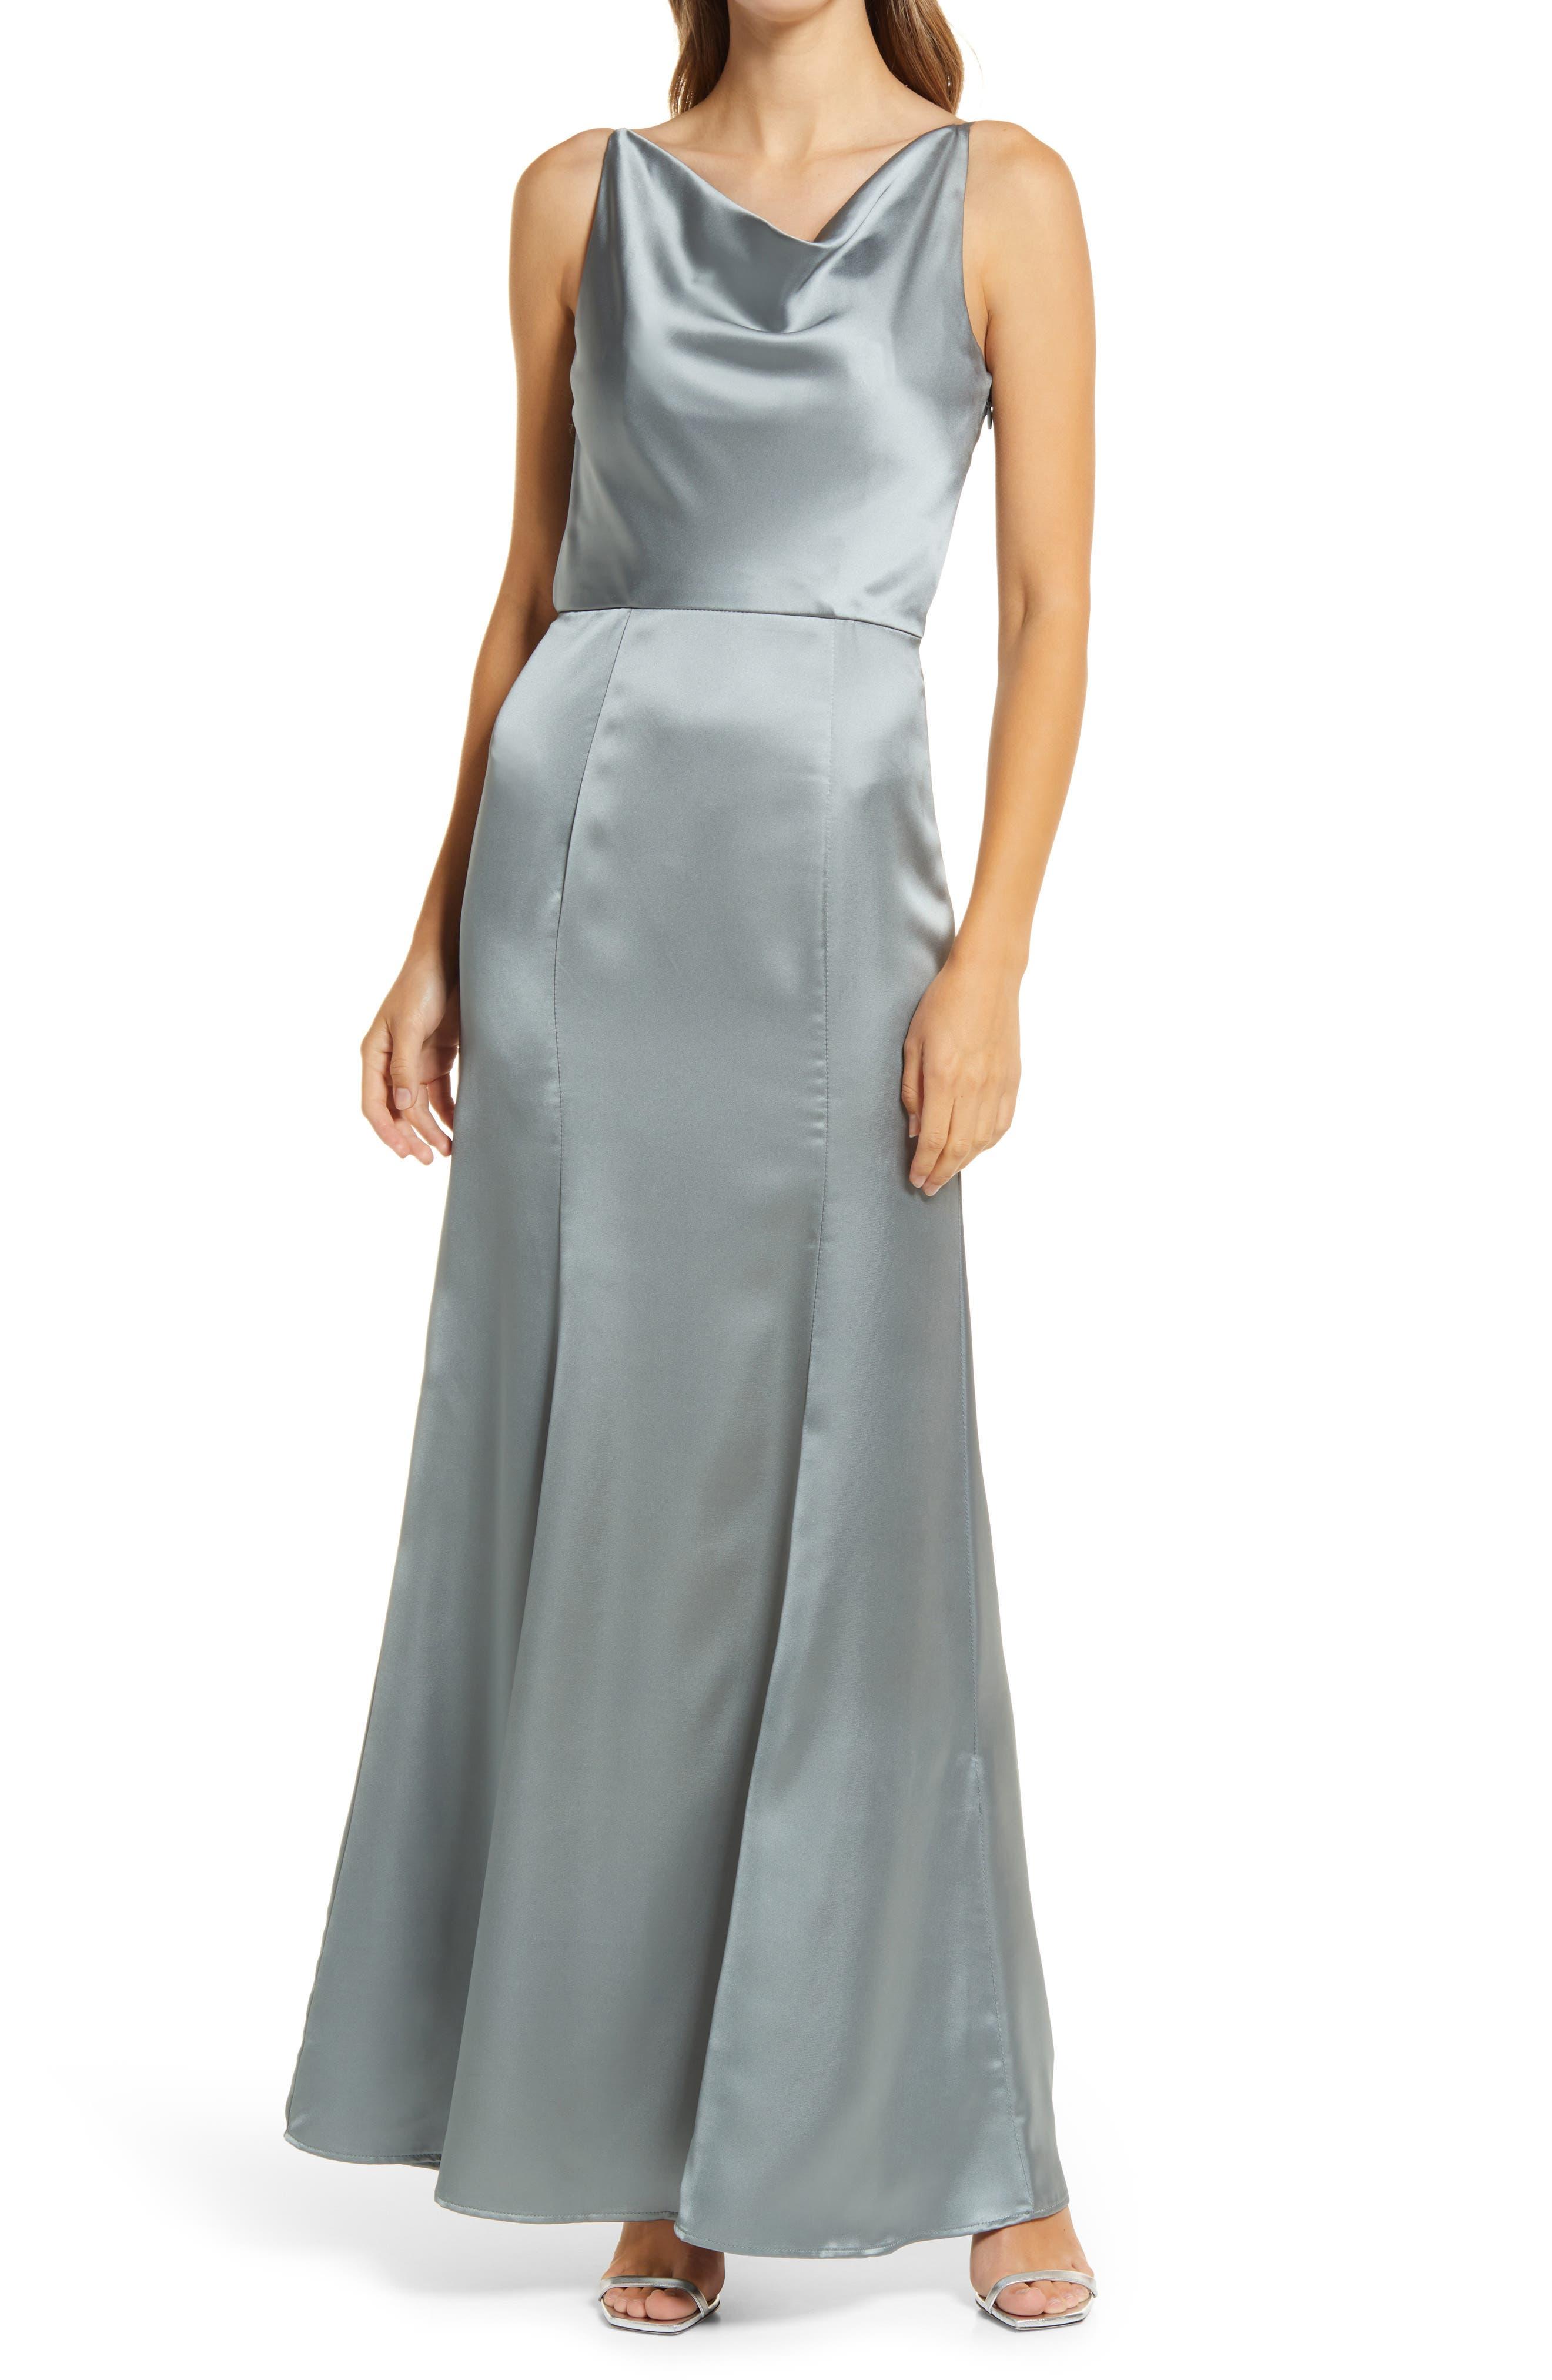 Julianna Cowl Neck Satin Gown